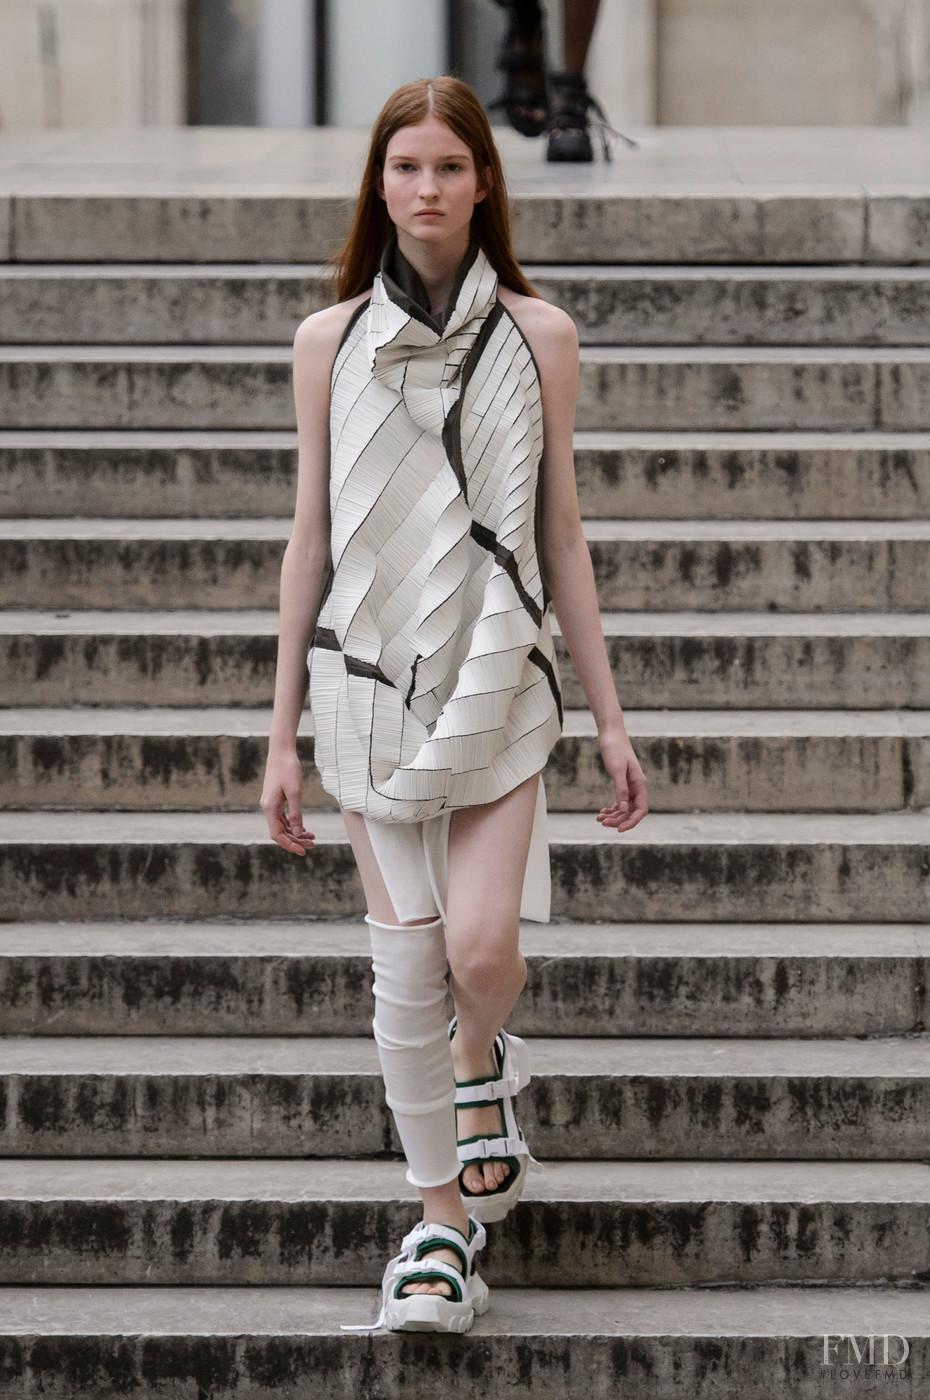 Rick owens fashion show 2018 30